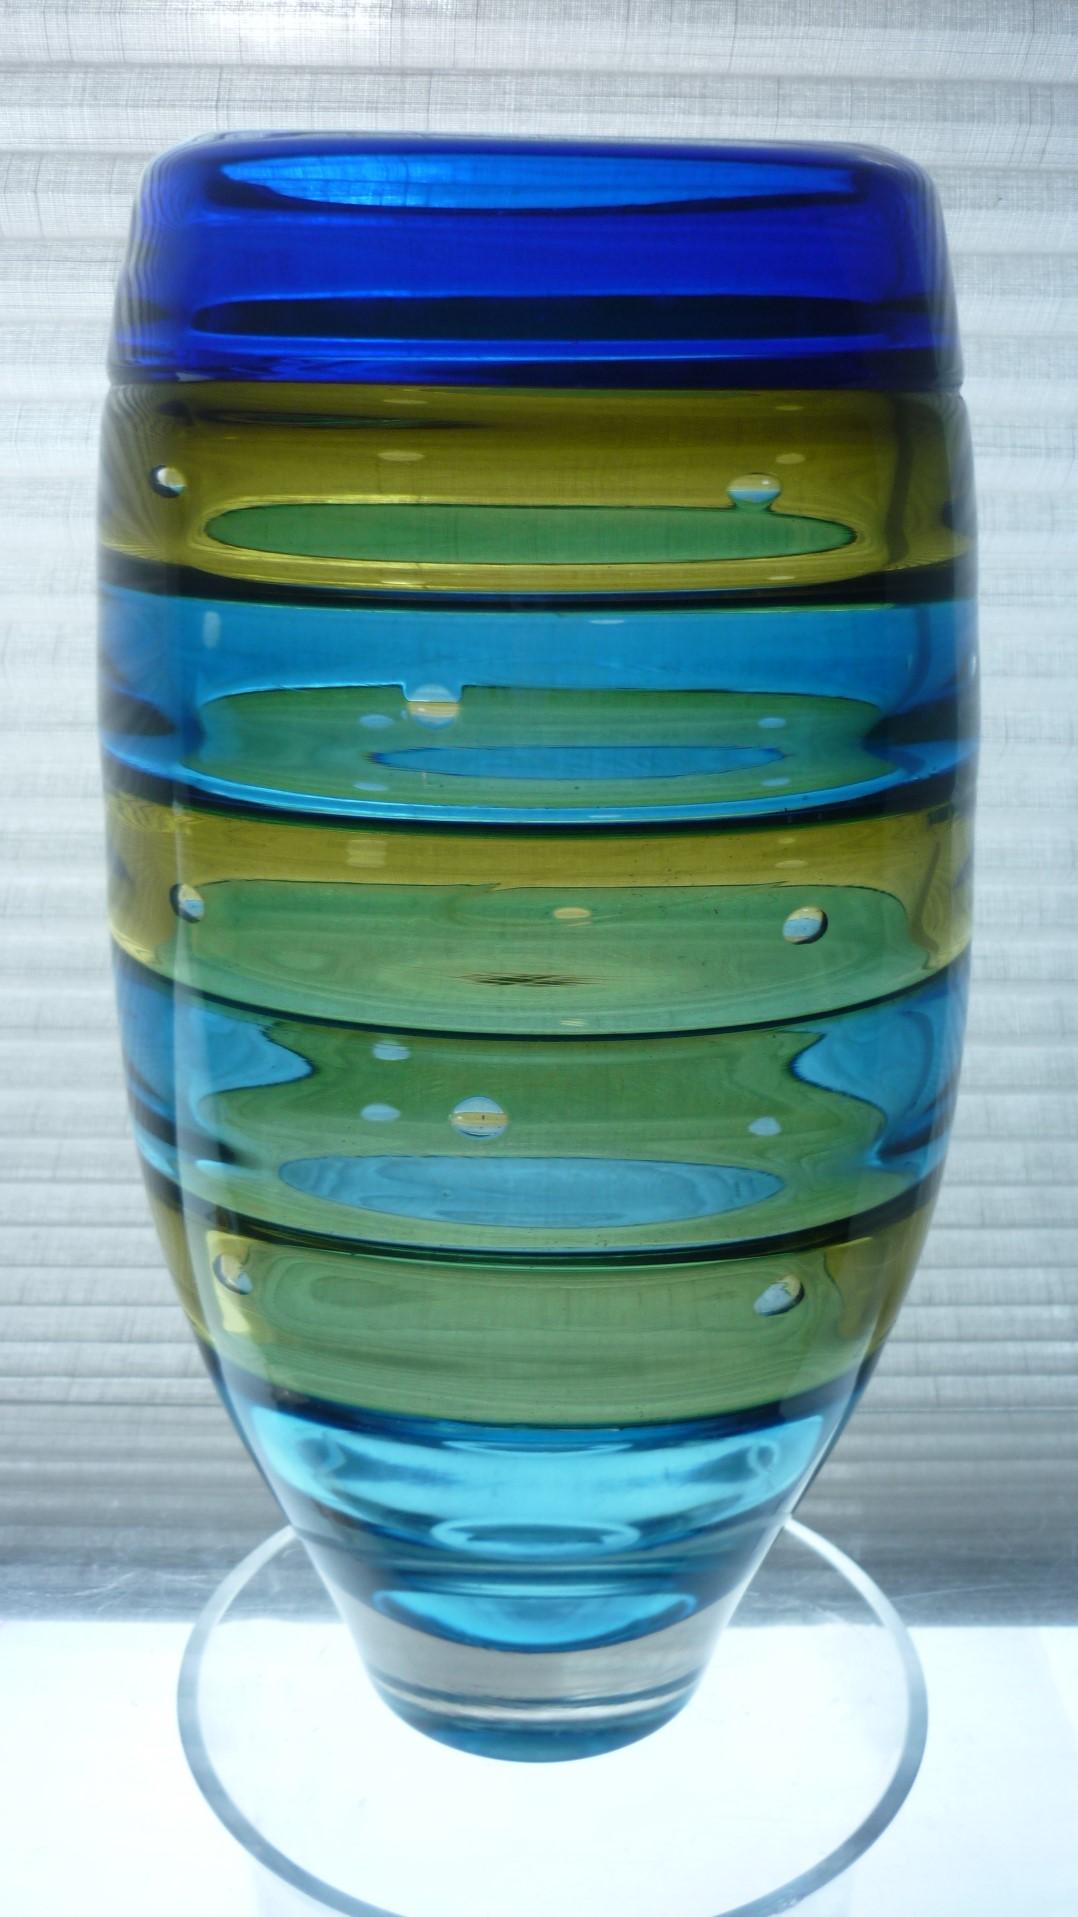 Superb piece of Studio Glass from English glass maker Stuart Ackroyd.